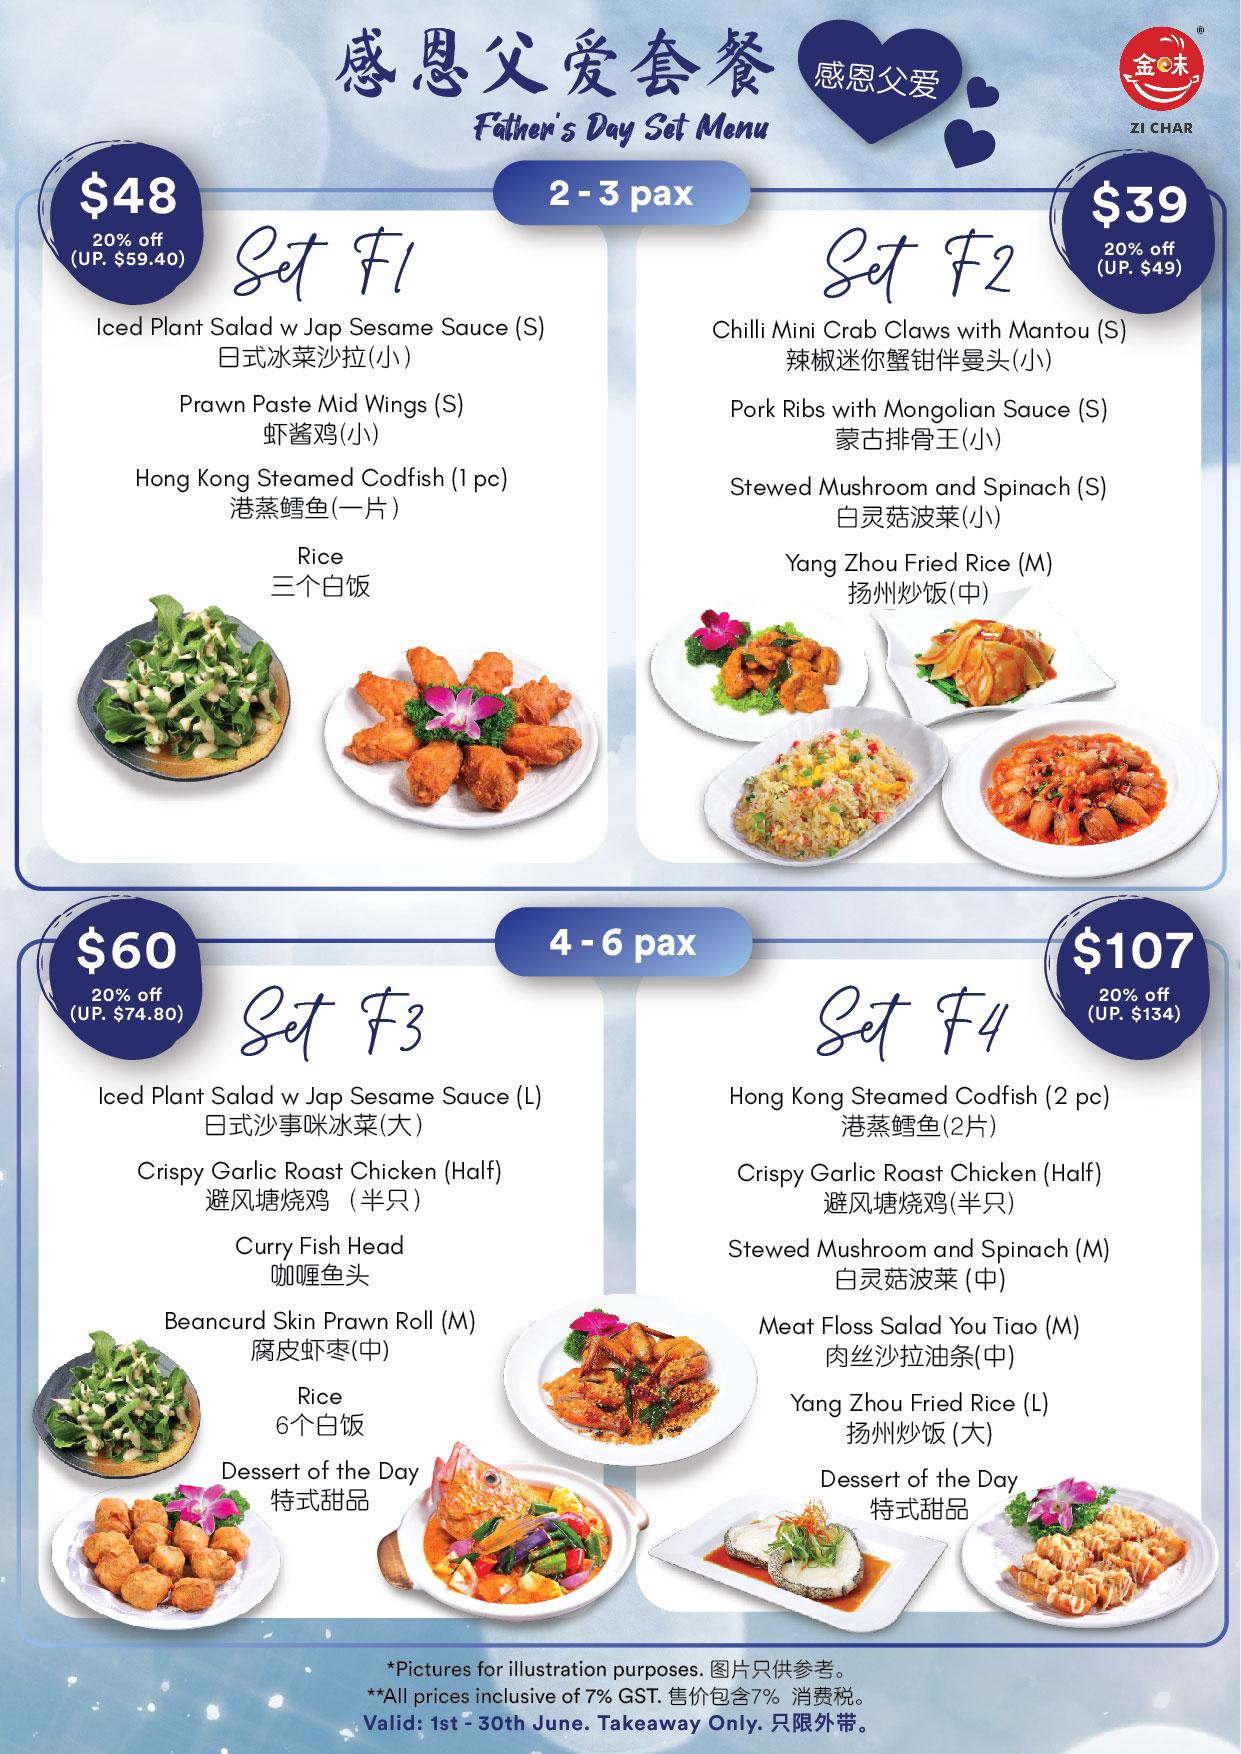 kimly_fathersday store menu (takeaway only)